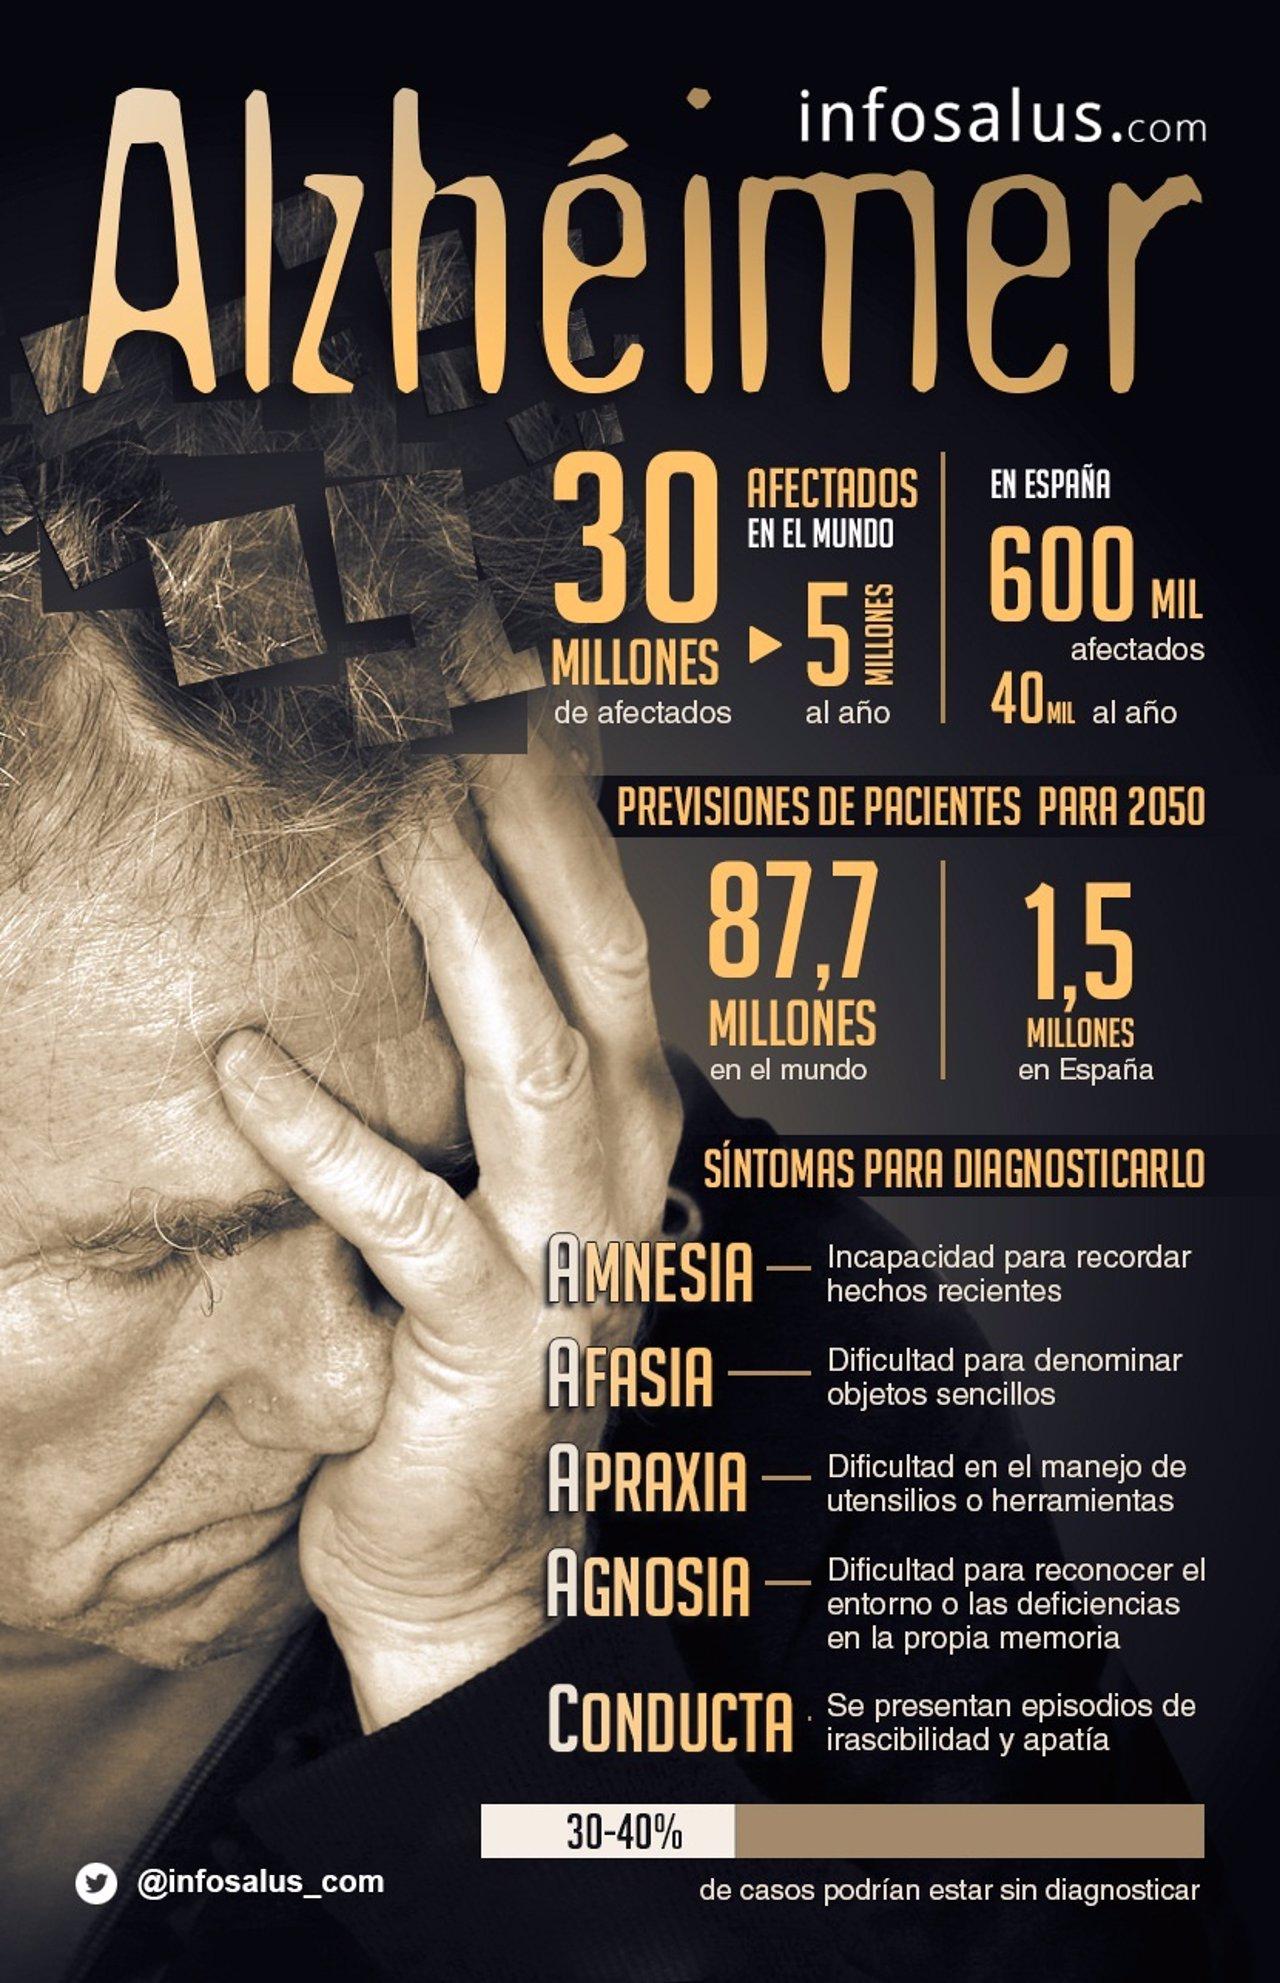 Infografía sobre el Alzheimer